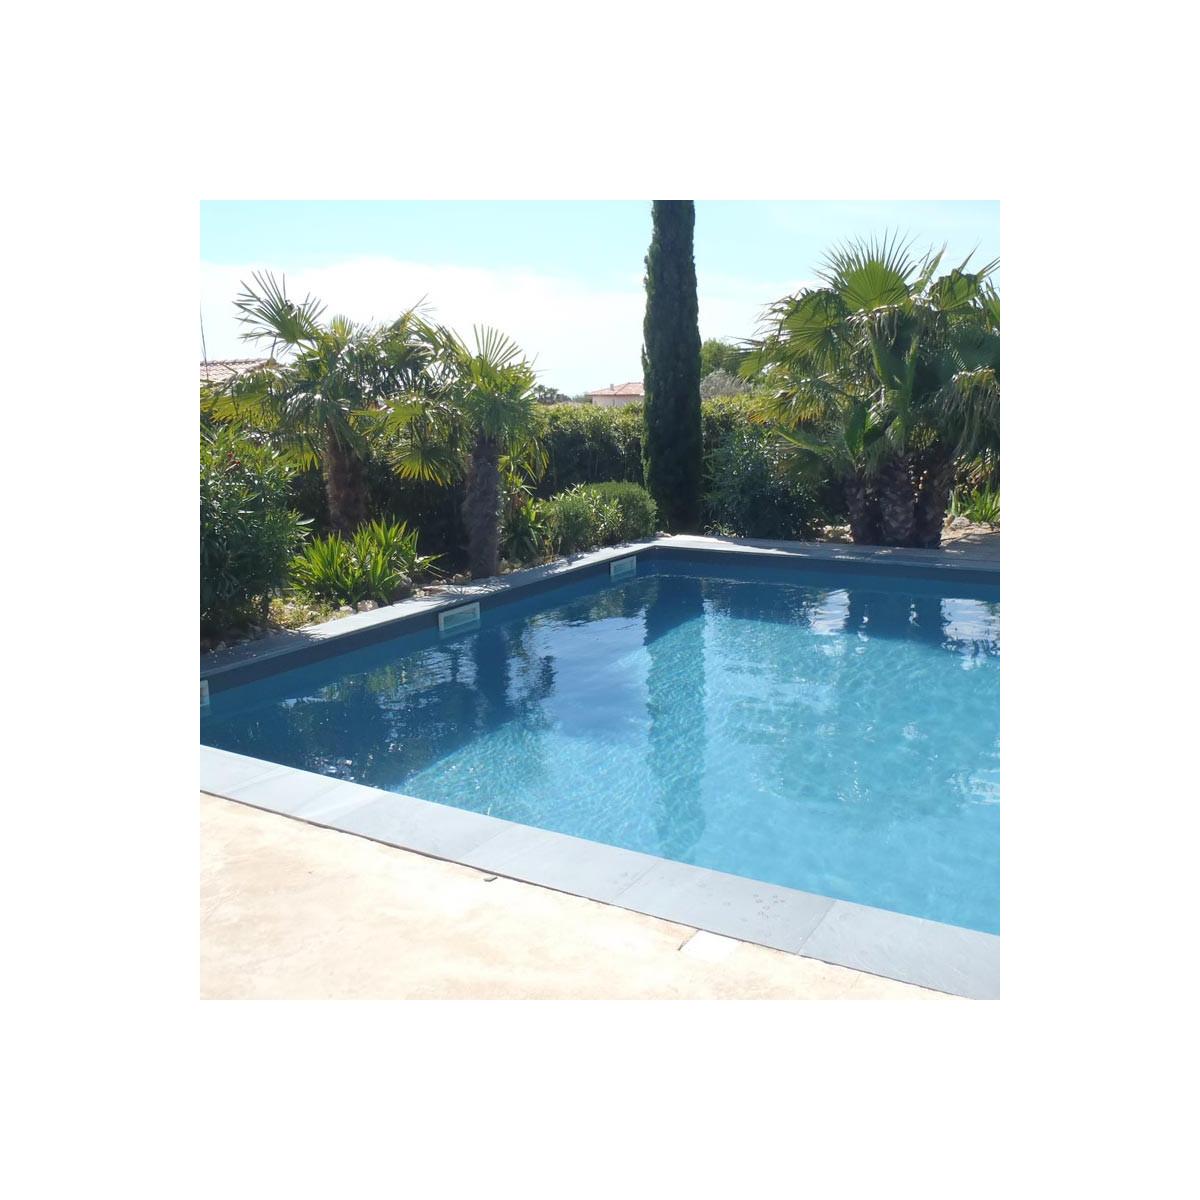 peinture protection piscine beton ciment d coration bassin. Black Bedroom Furniture Sets. Home Design Ideas